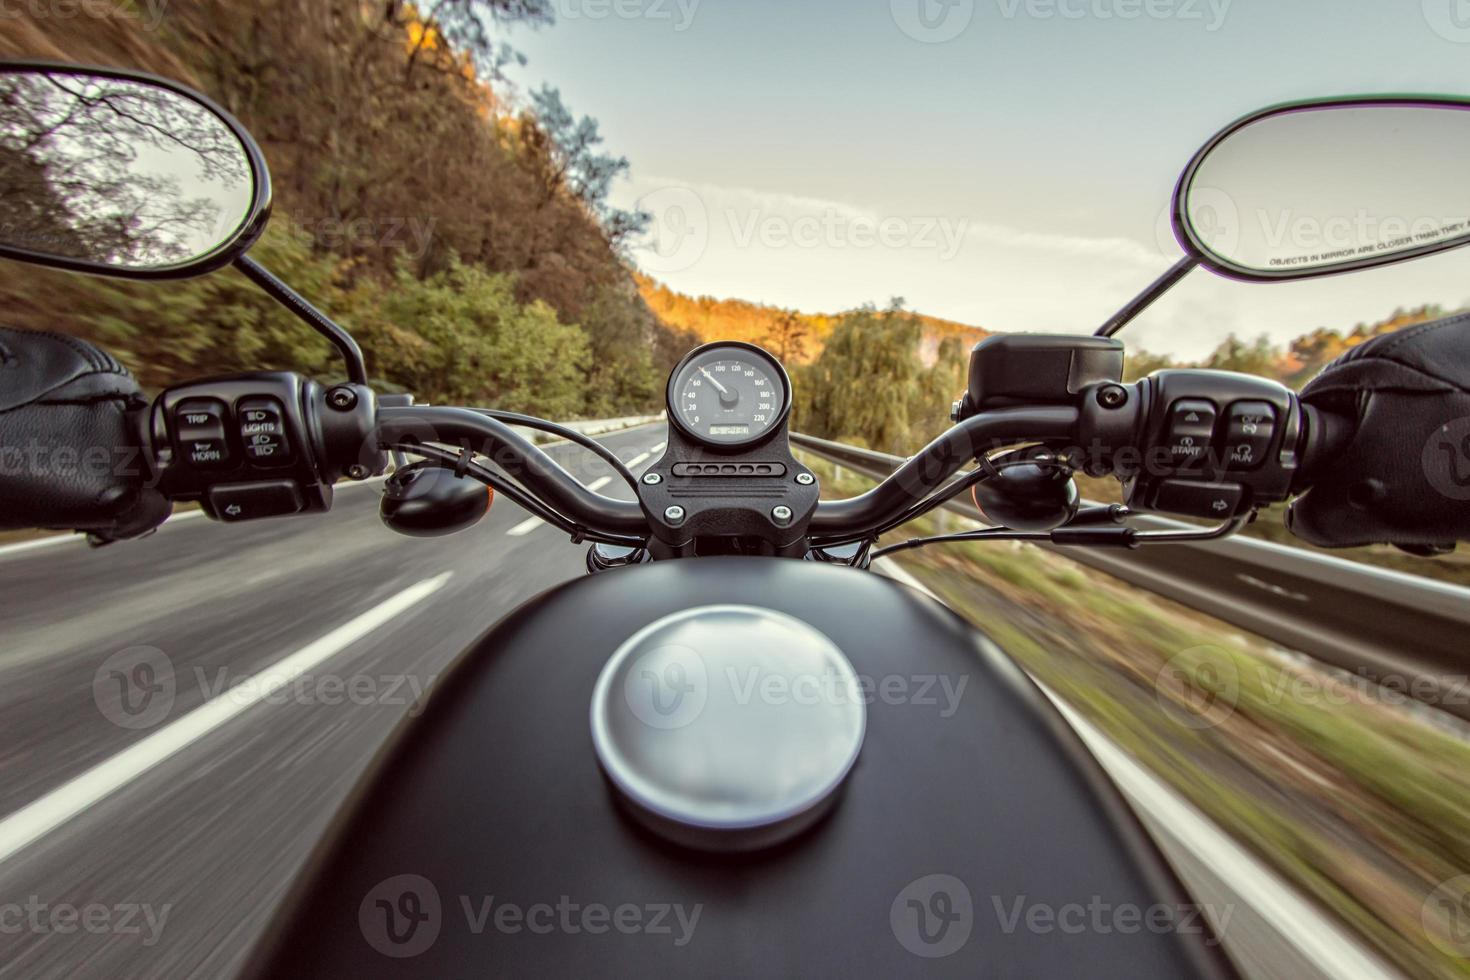 la vista sobre el manillar de la motocicleta foto